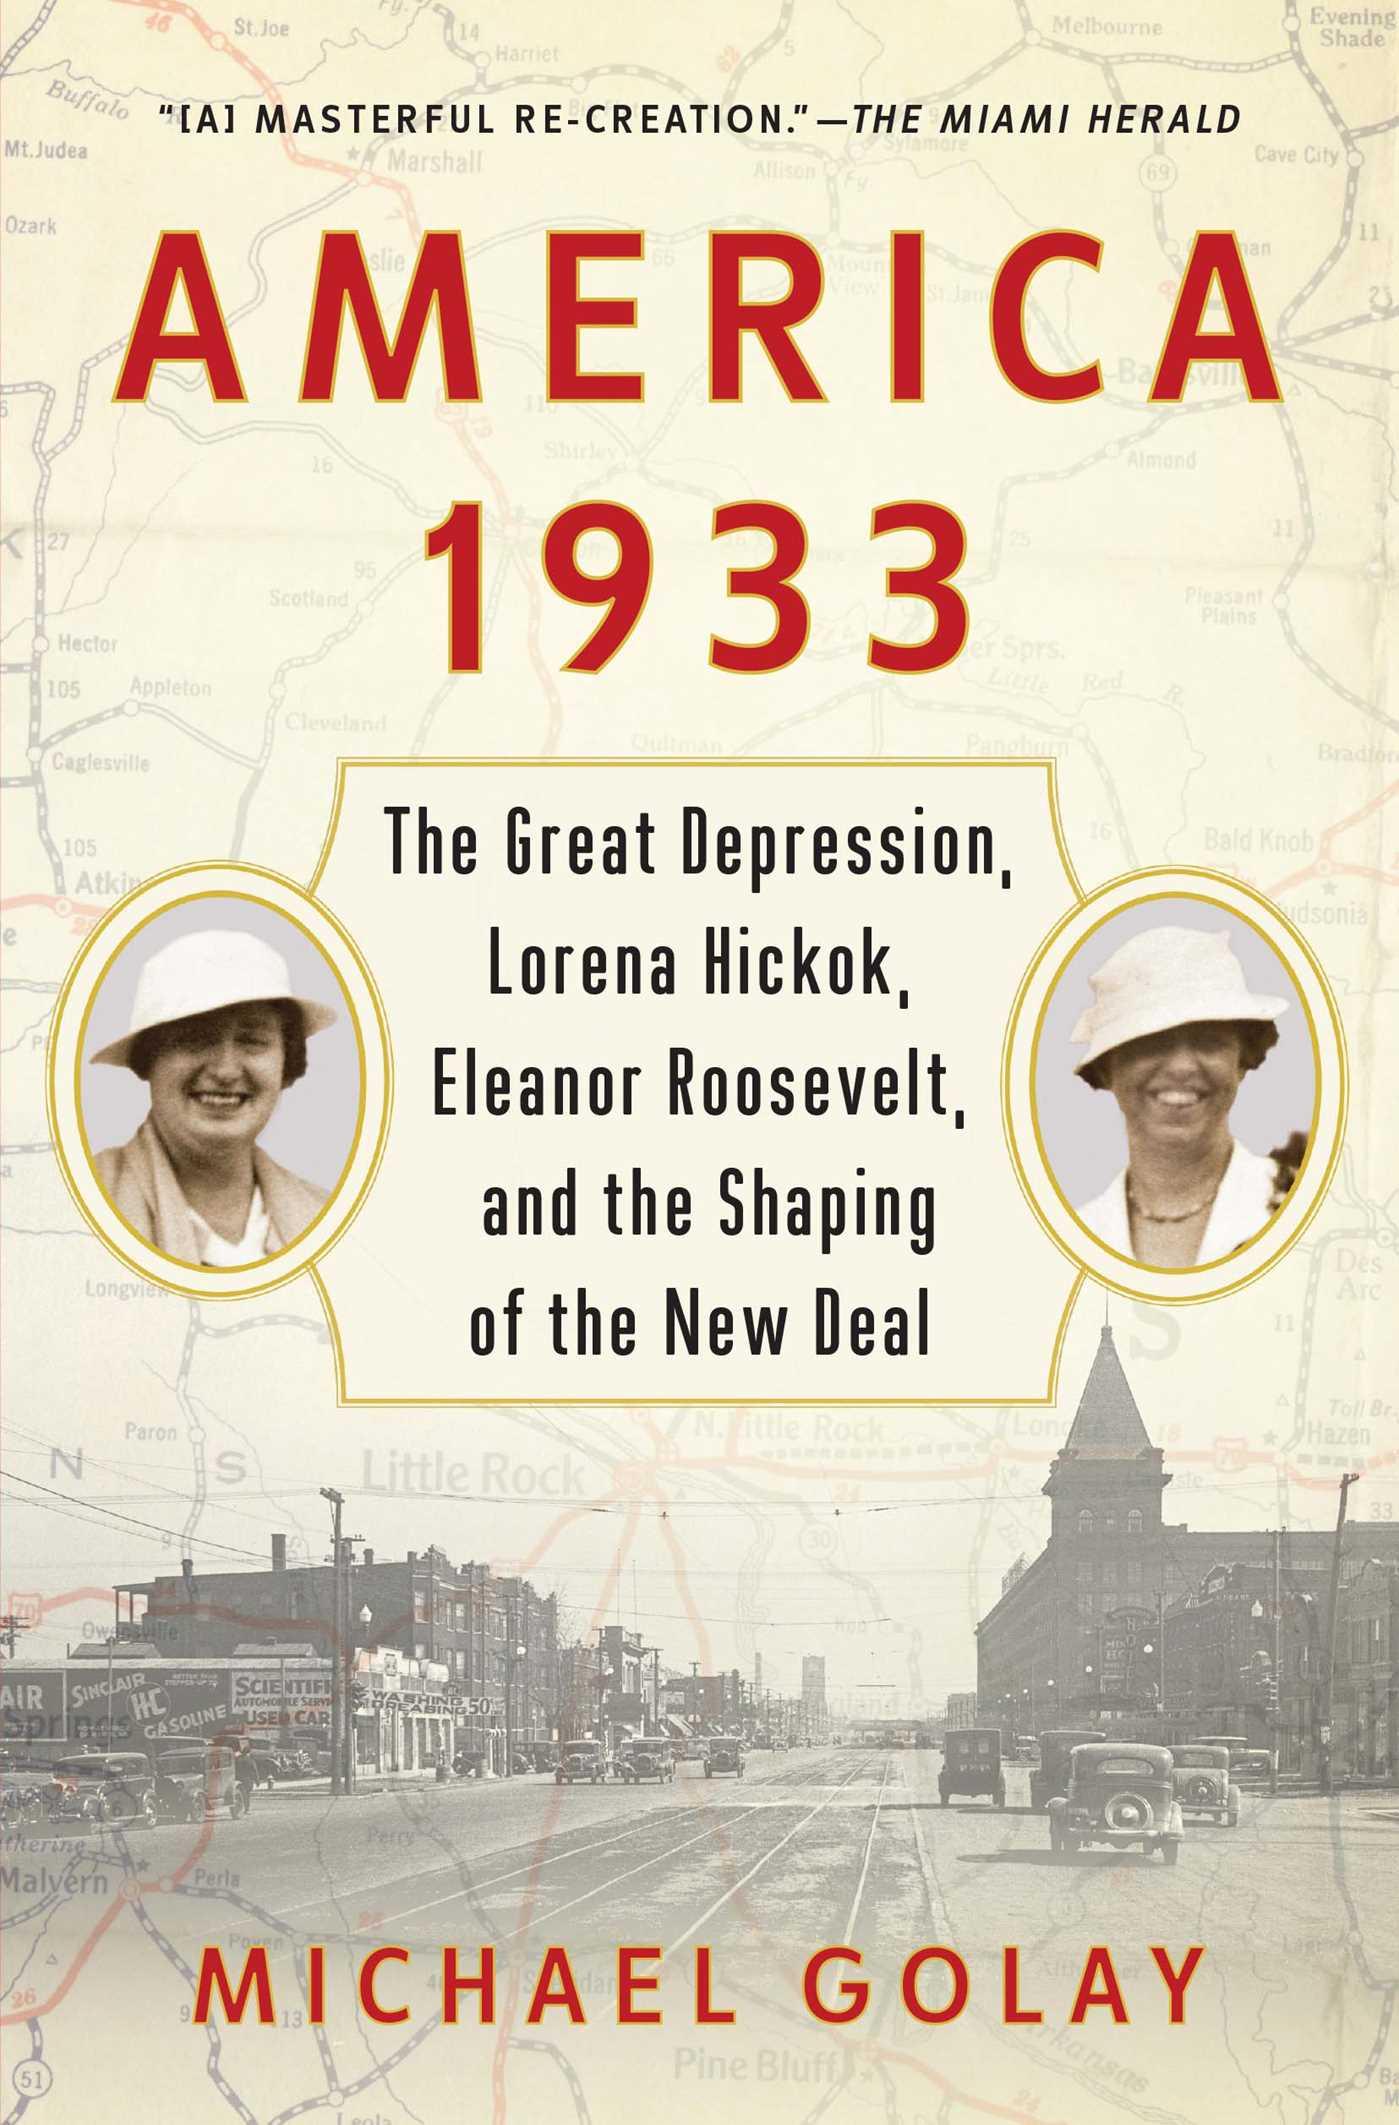 Book Cover Image (jpg): America 1933